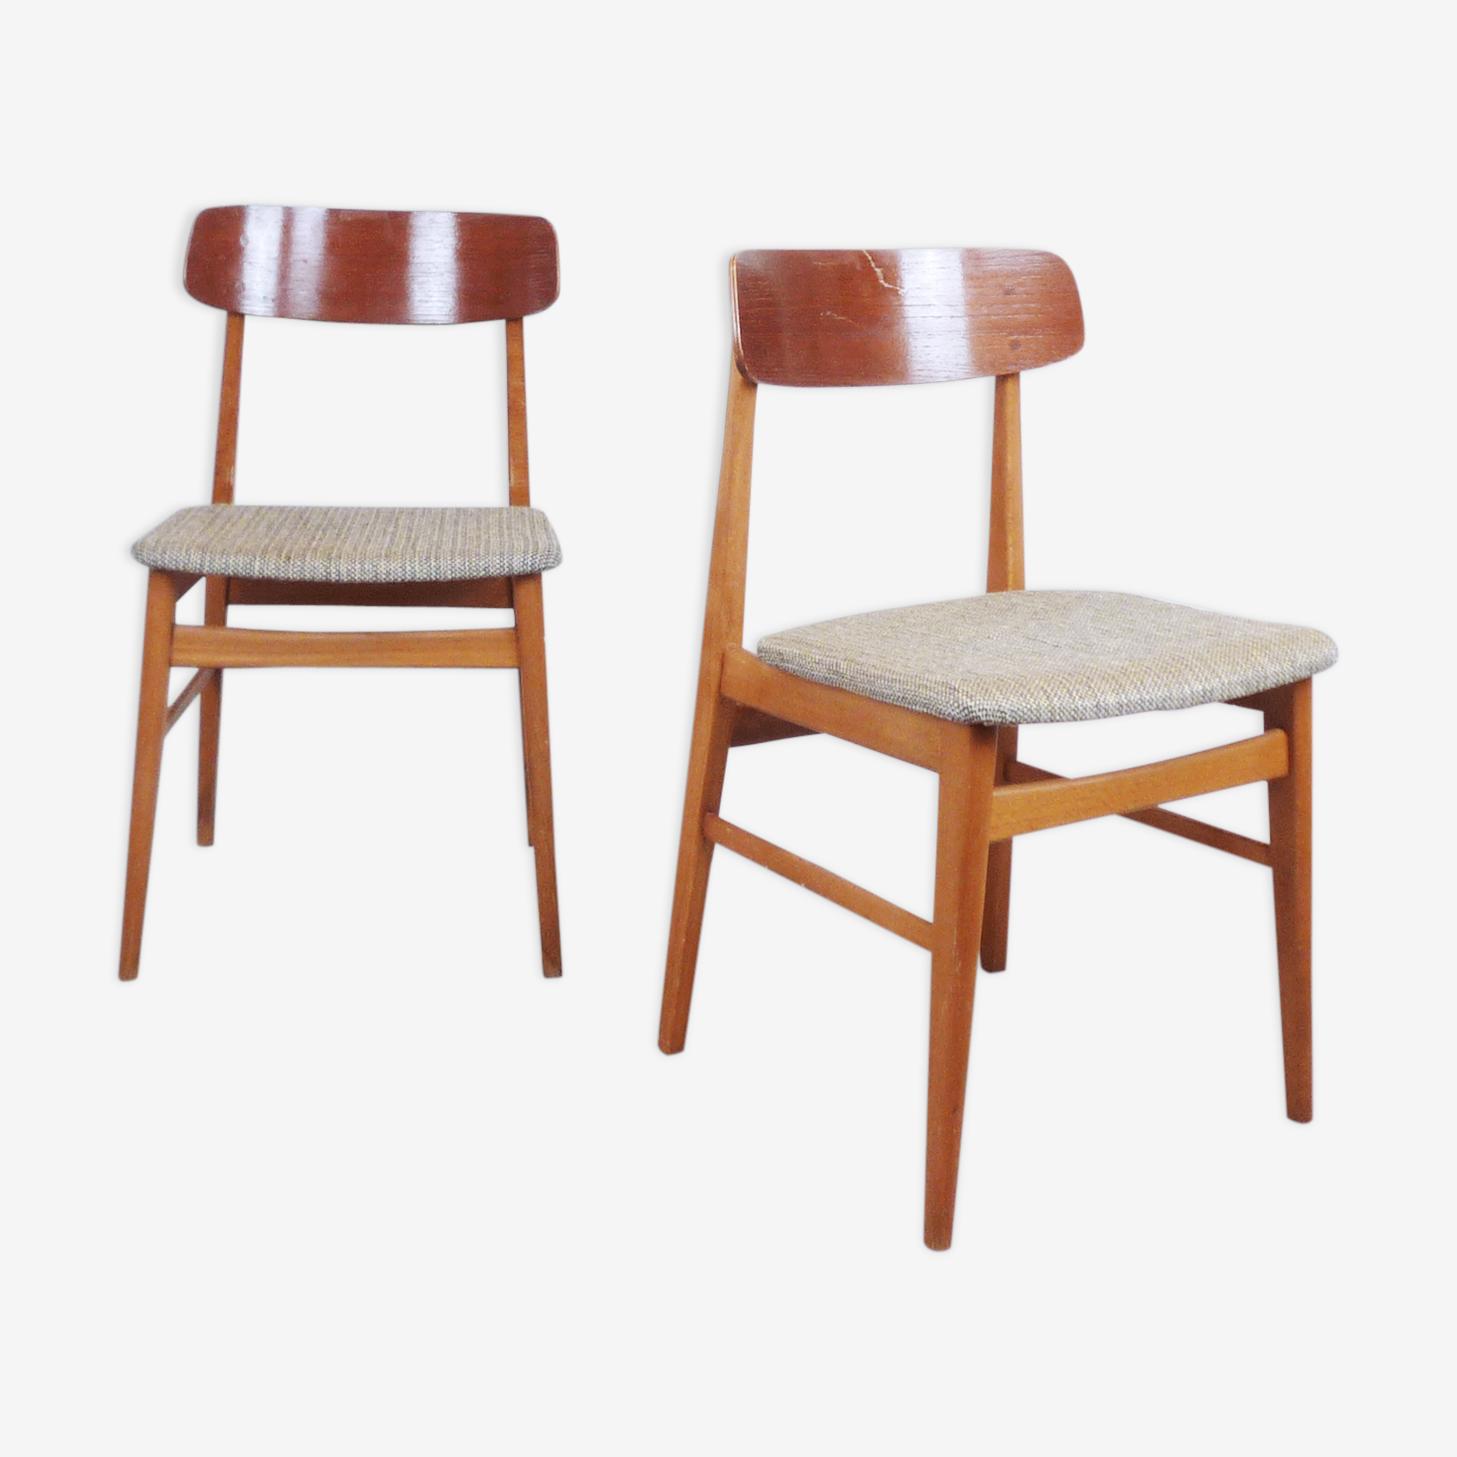 Danish chairs in teak, 1950